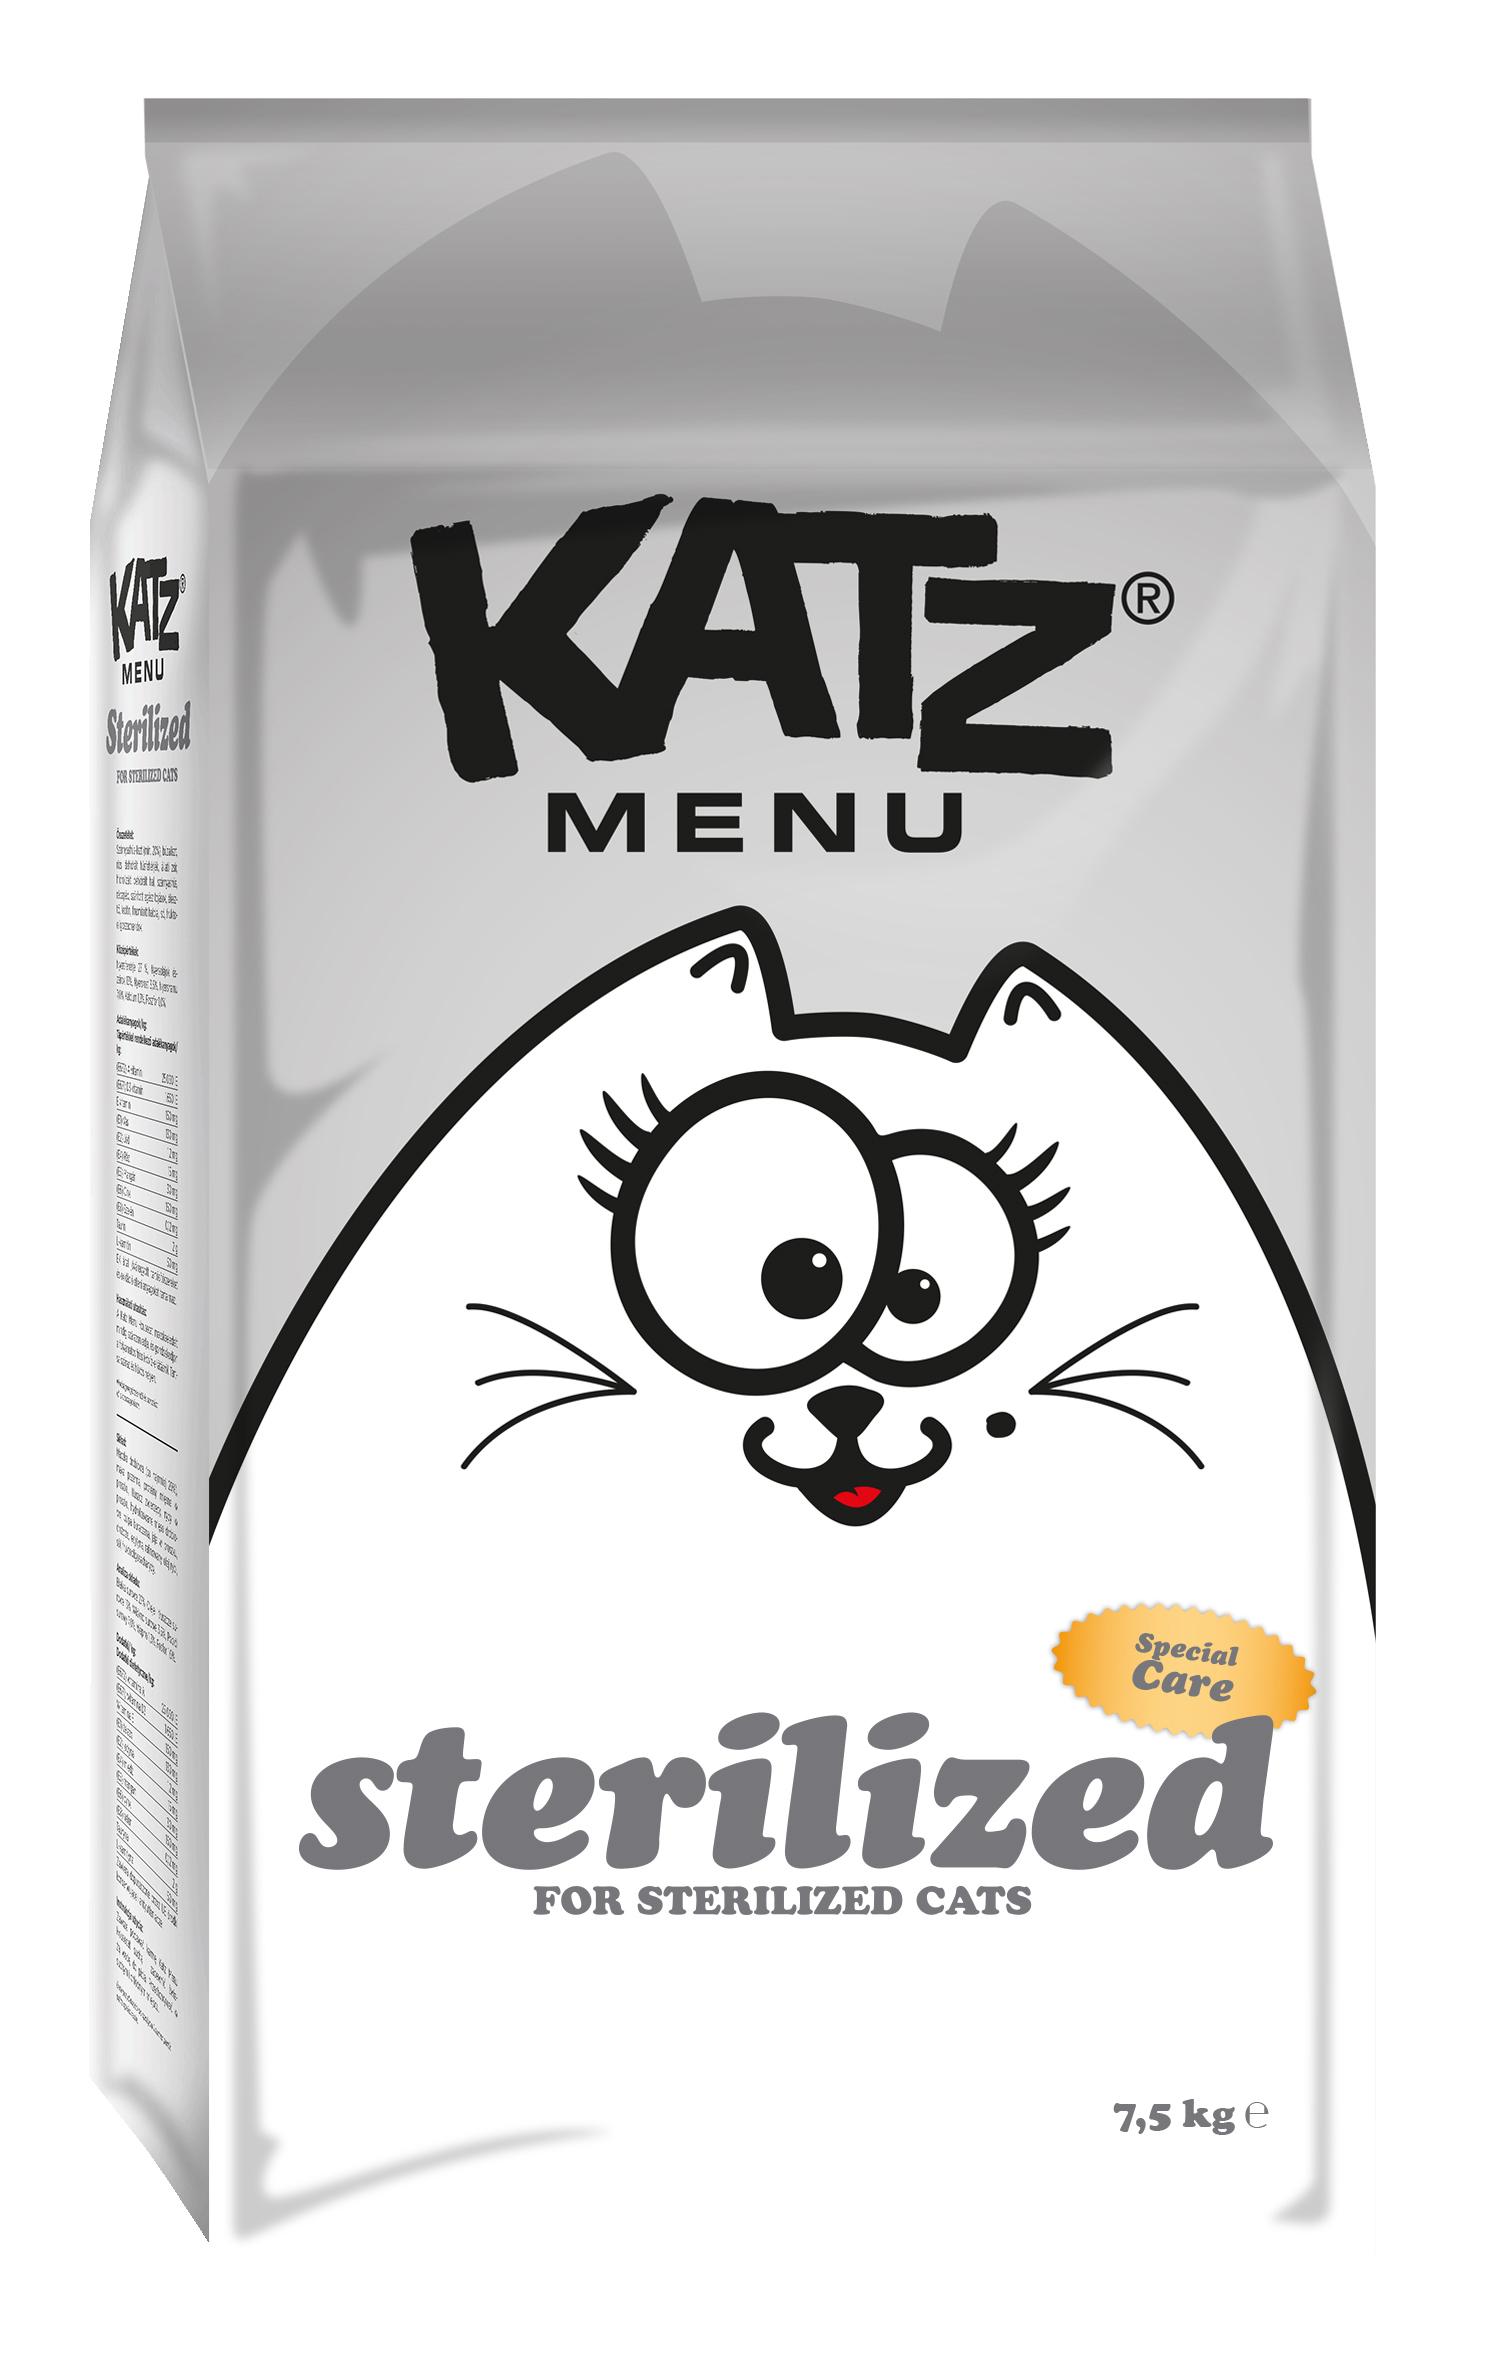 Katz Menu Sterilized 7.5kg